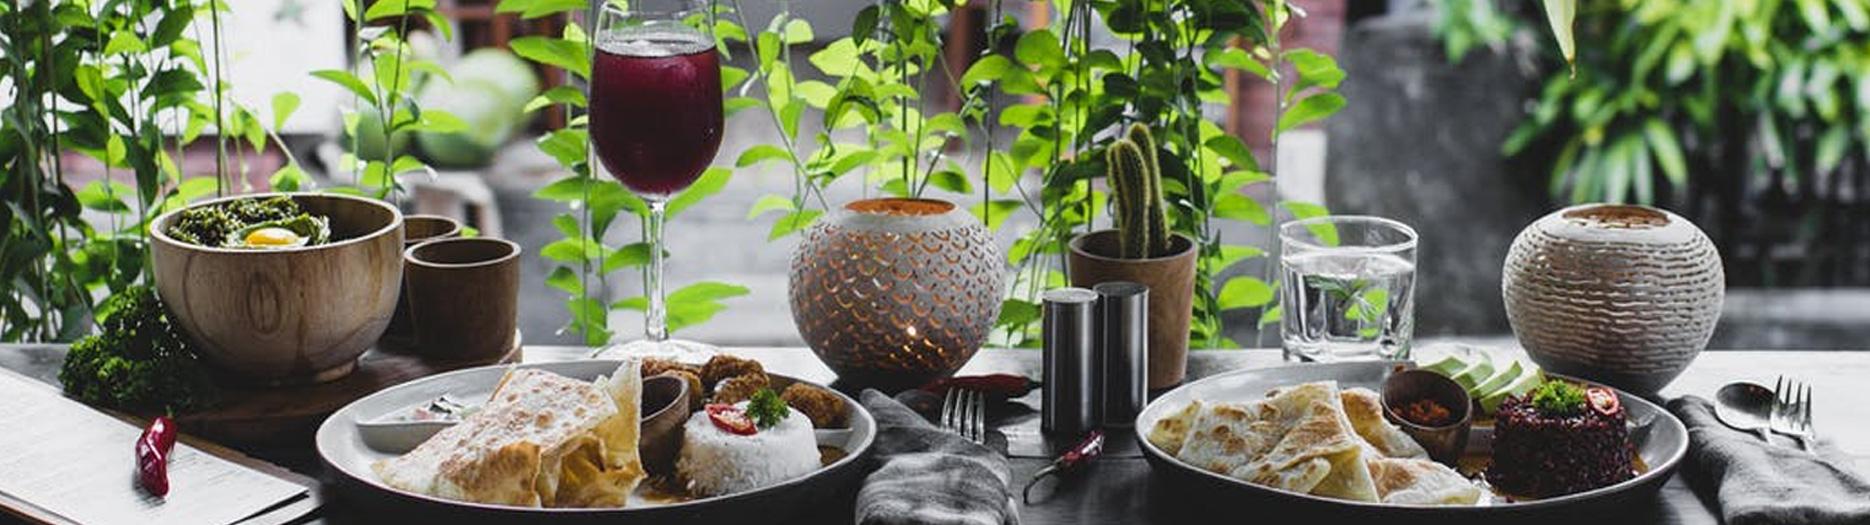 Food-and-Beverage-Banner